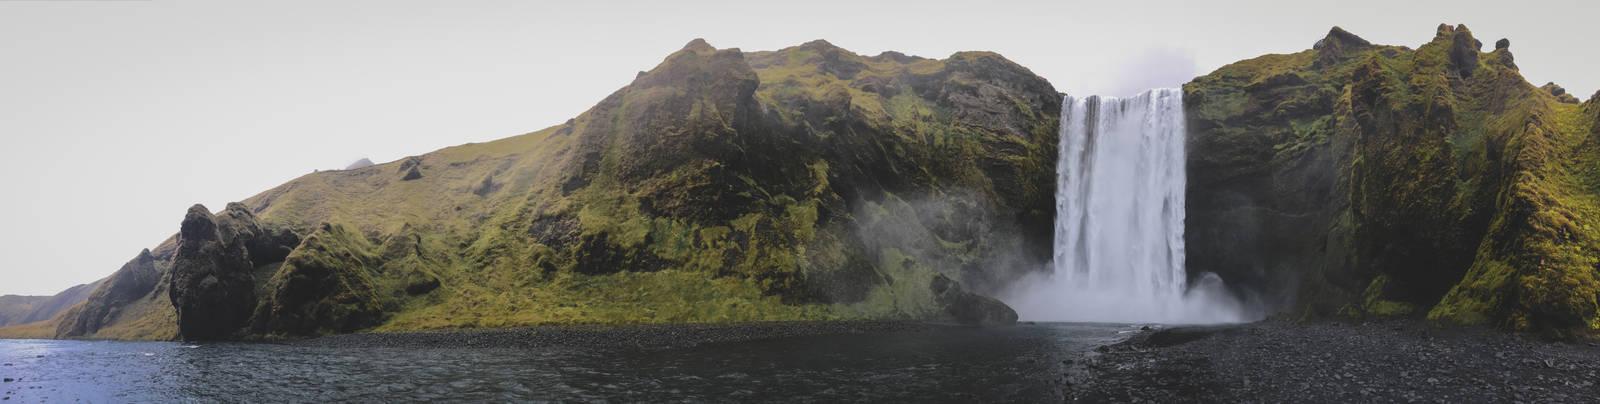 Skogafoss panoramic